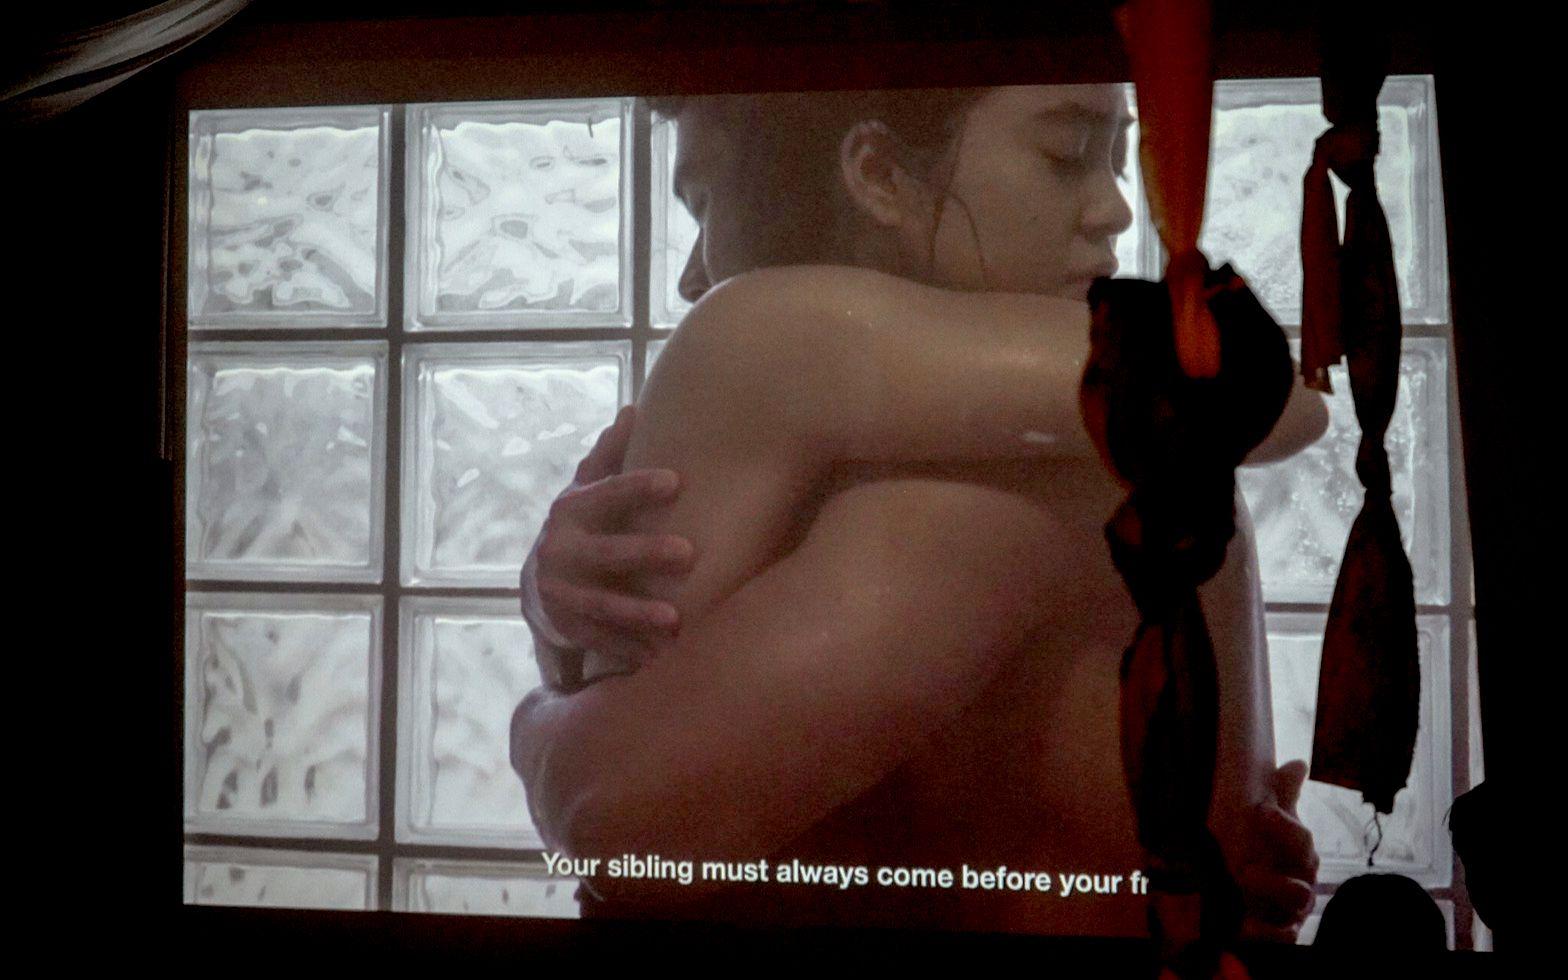 ATT19 Presents Prim Patnasiri's First Solo Exhibition With Mental Health Message